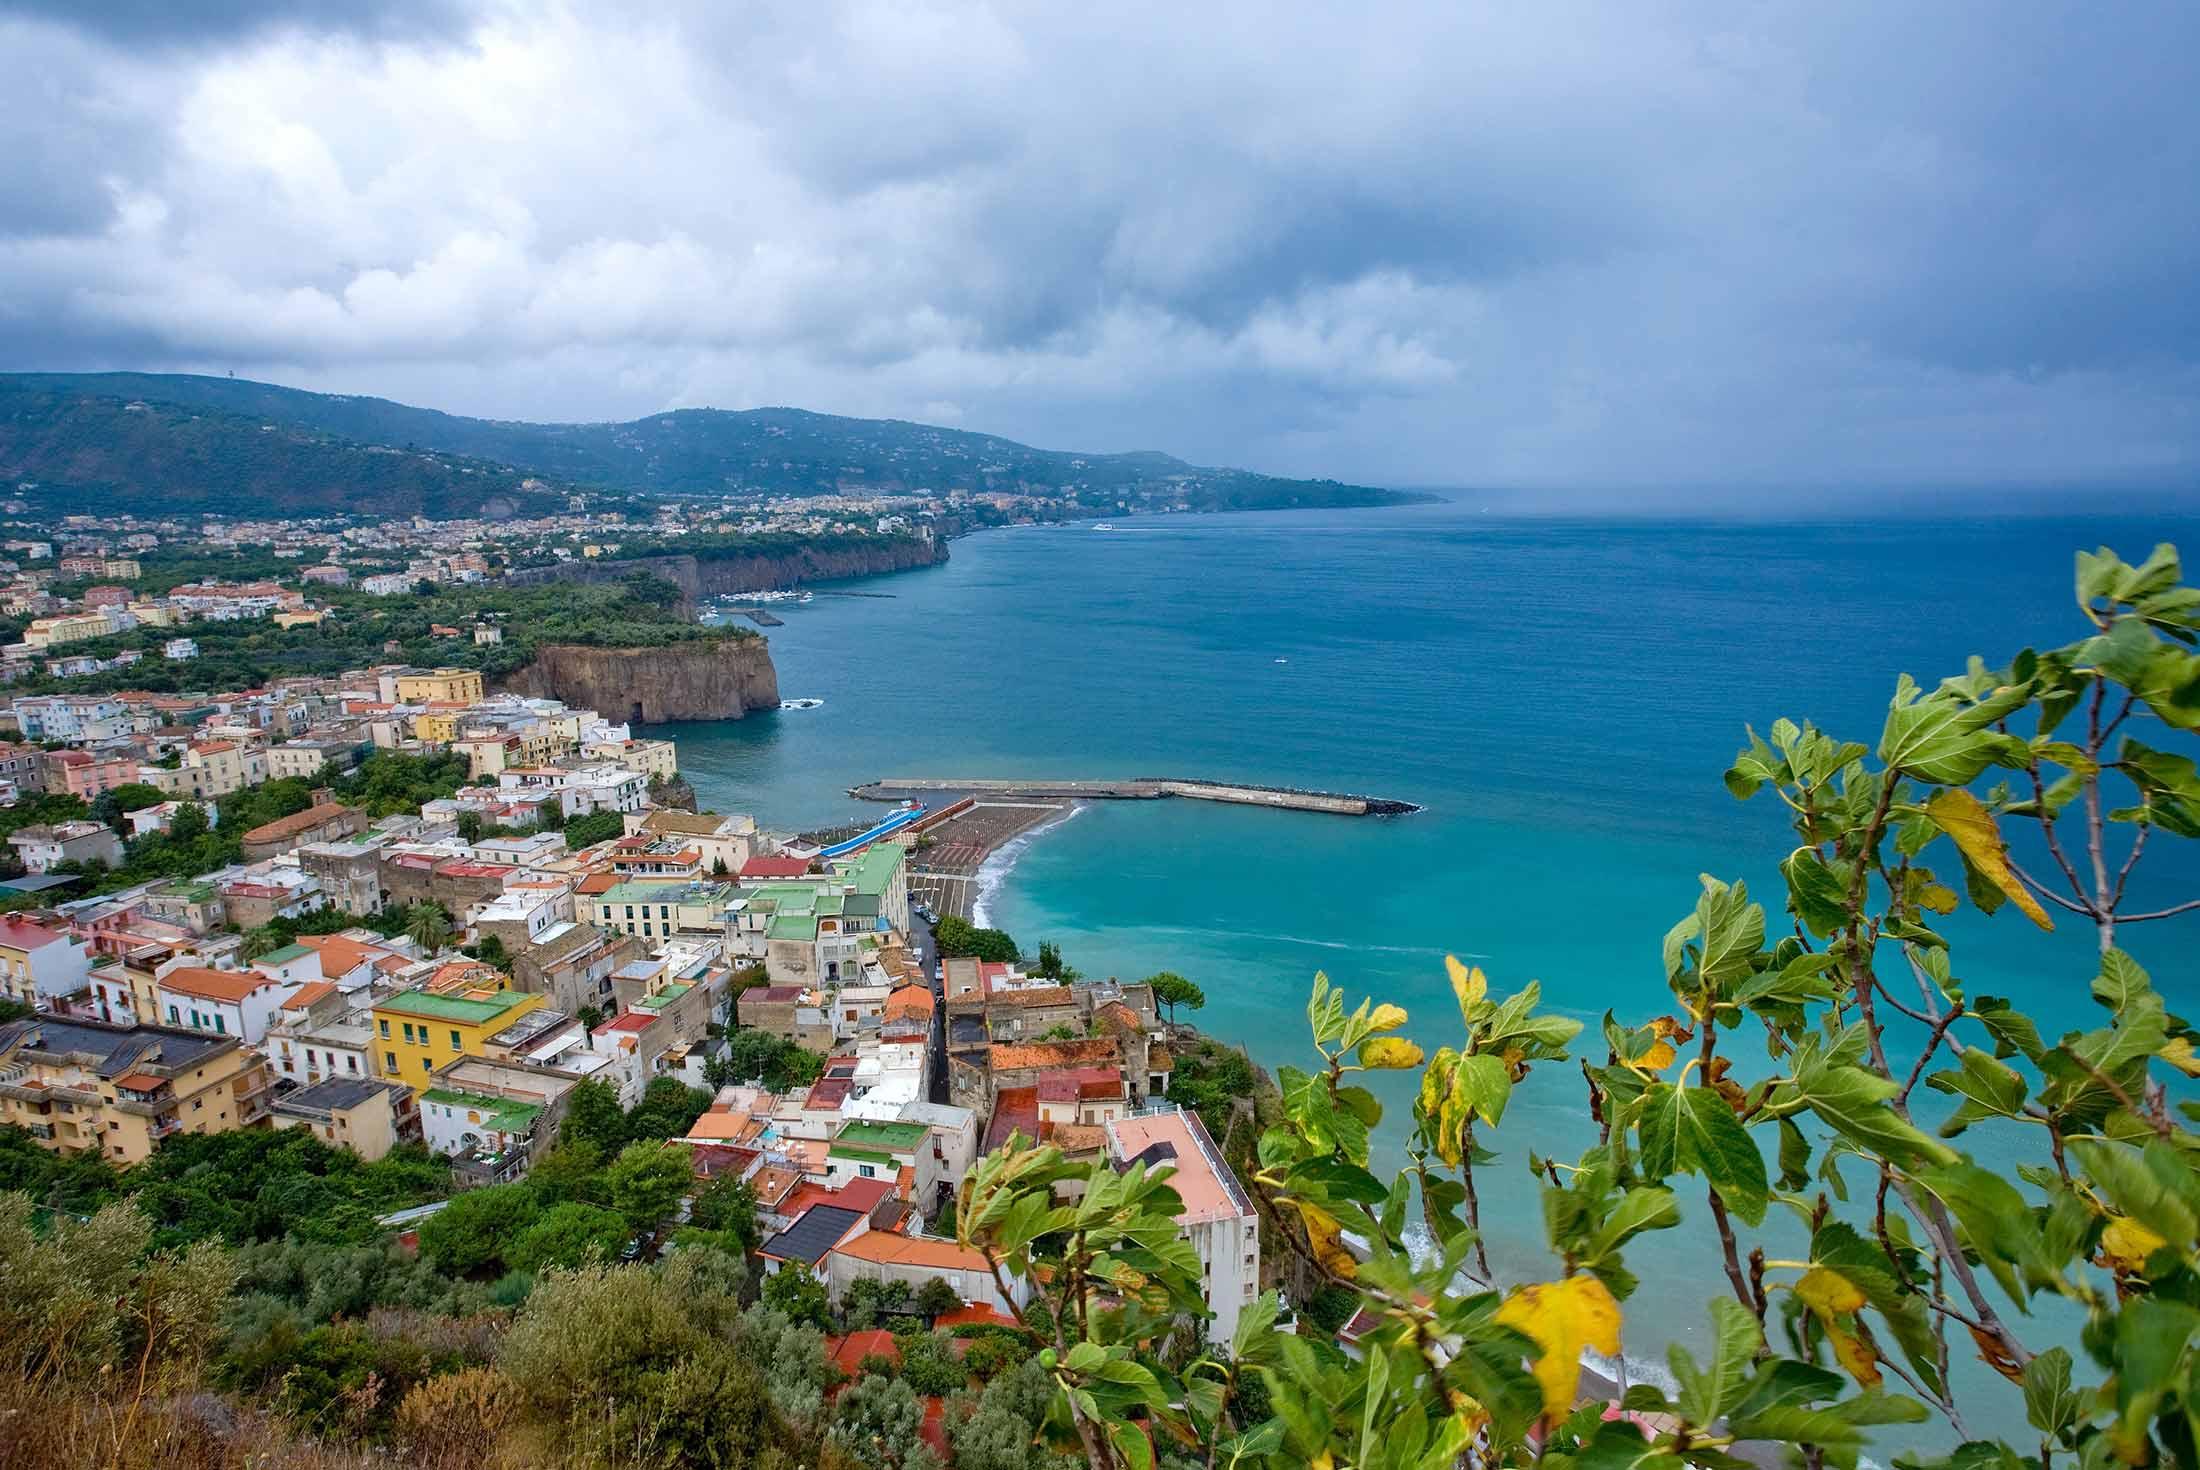 Walking in Italy: The Amalfi Coast 4